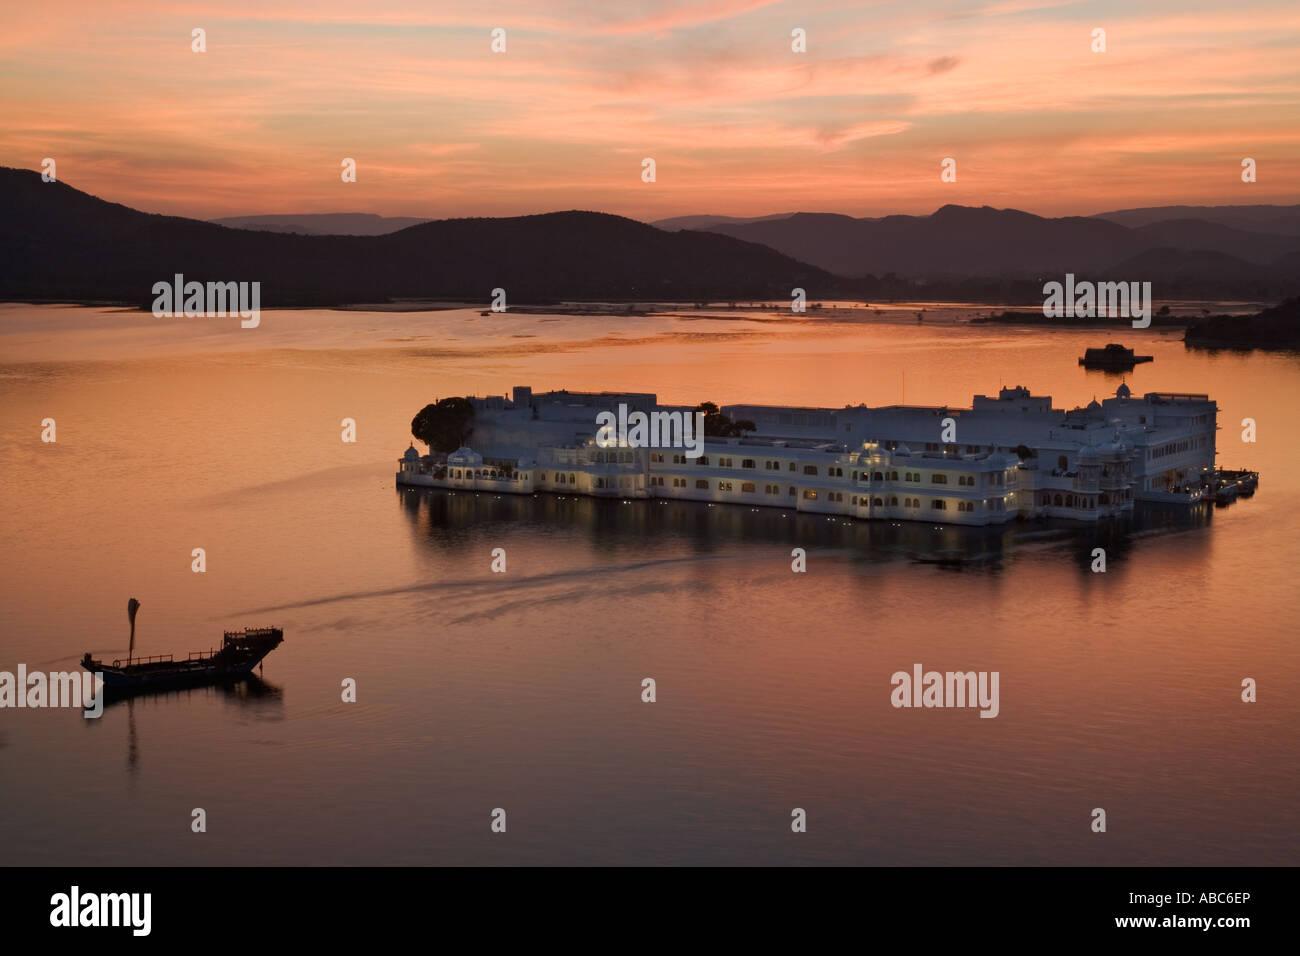 JAG Niwas bei Sonnenuntergang auch bekannt als das Lake Palace Hotel. Pichola-See. Udaipur, Indien Stockbild